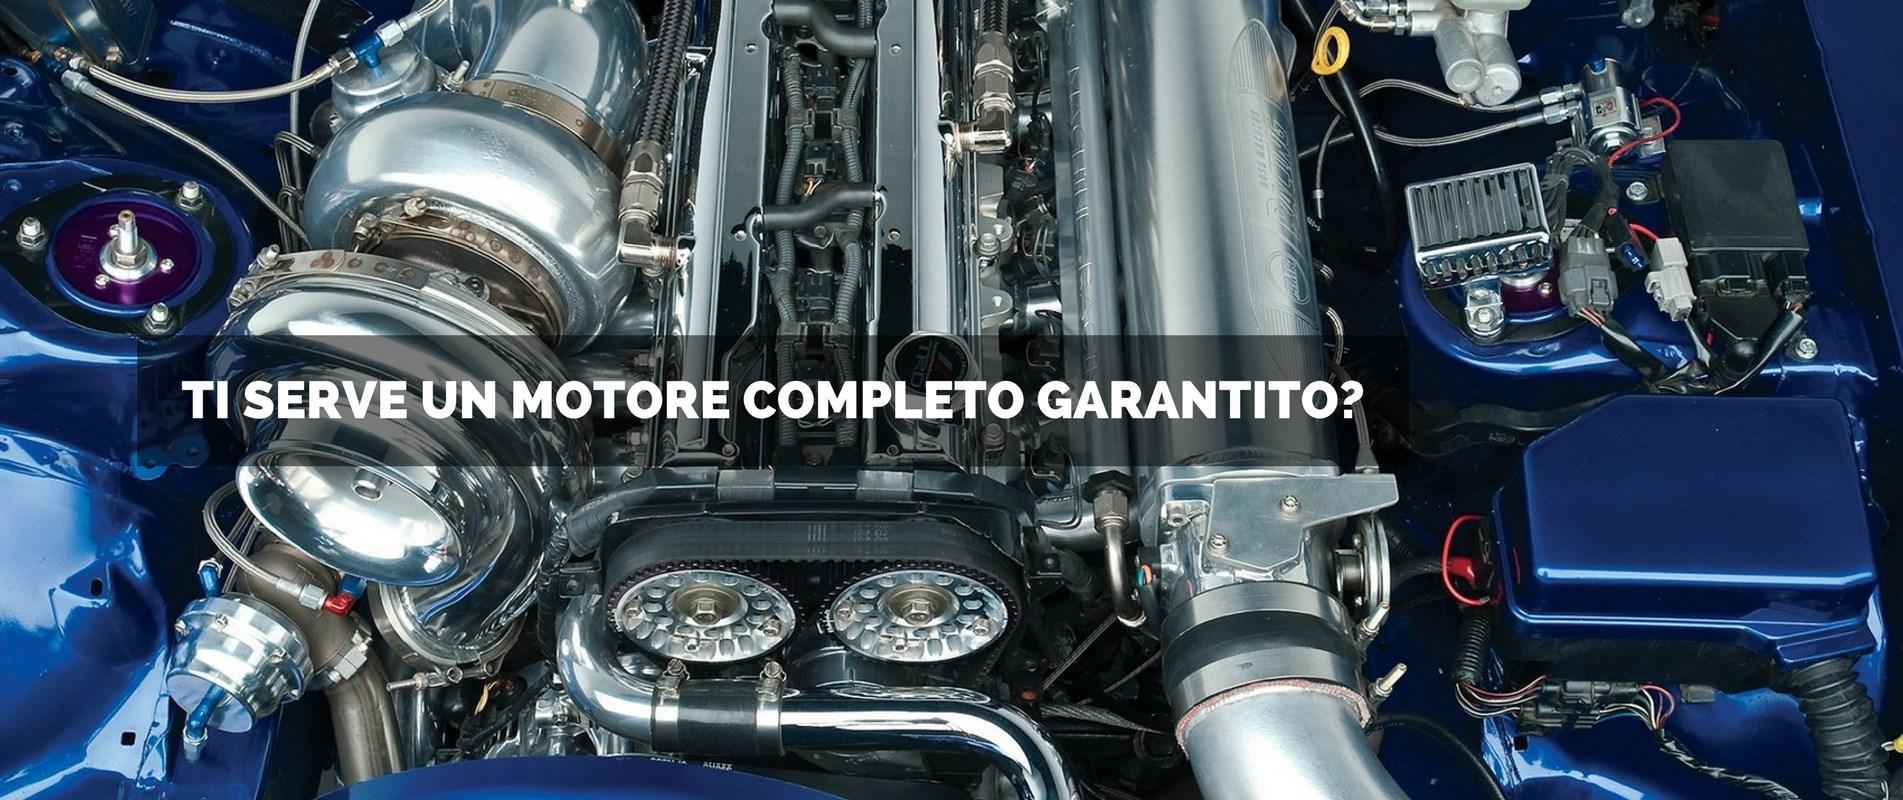 Track- Frame motori importati completi garantiti